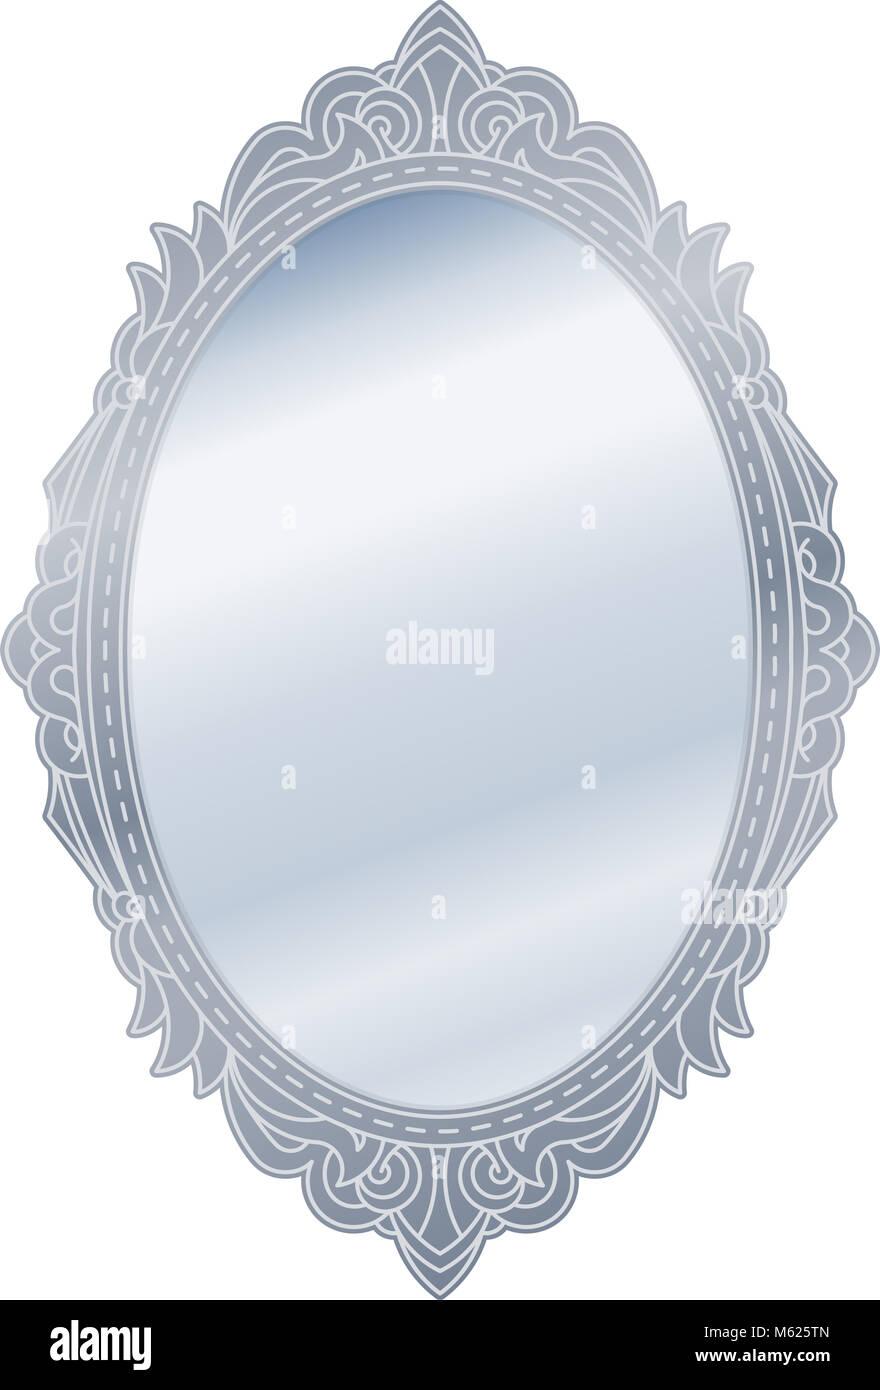 Mirror In Retro Vintage Oval Ornate Silver Border Frame Vector Stock Photo 175840133